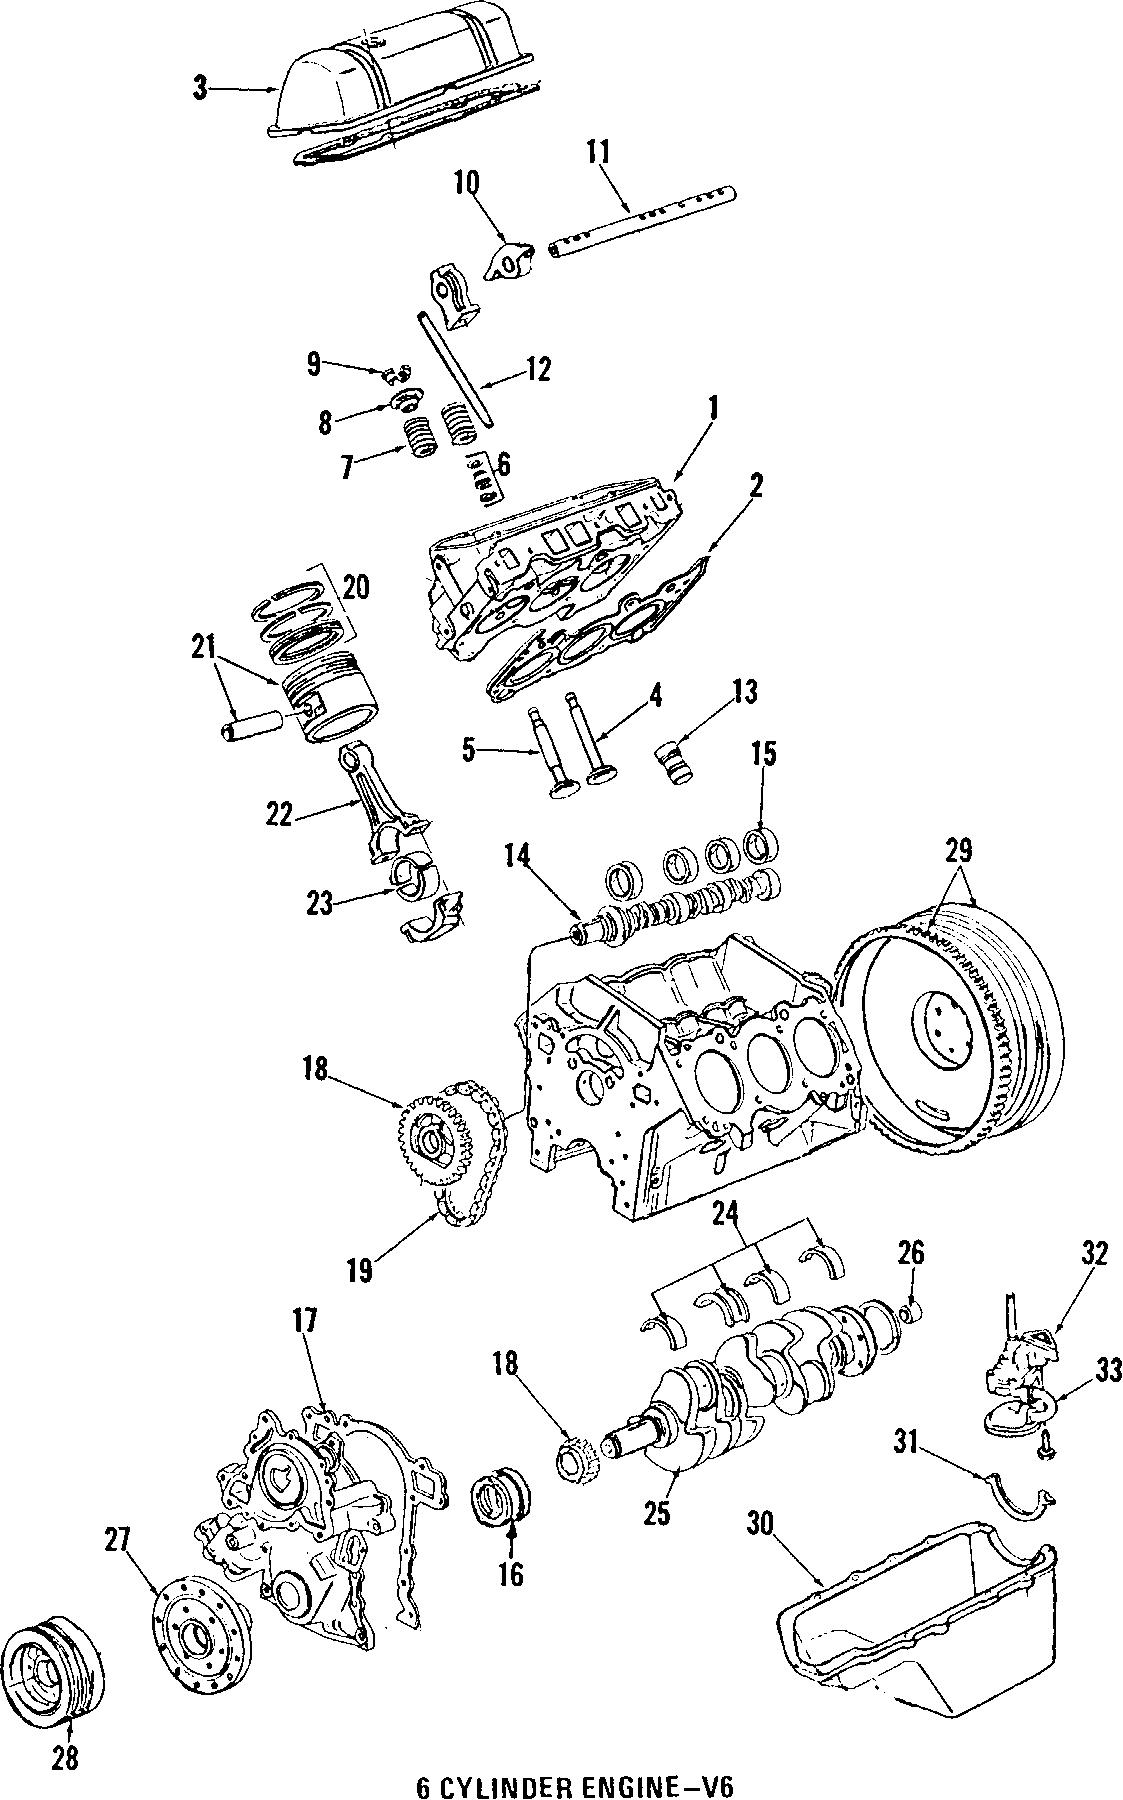 Pontiac Firebird Engine Crankshaft Pulley Series